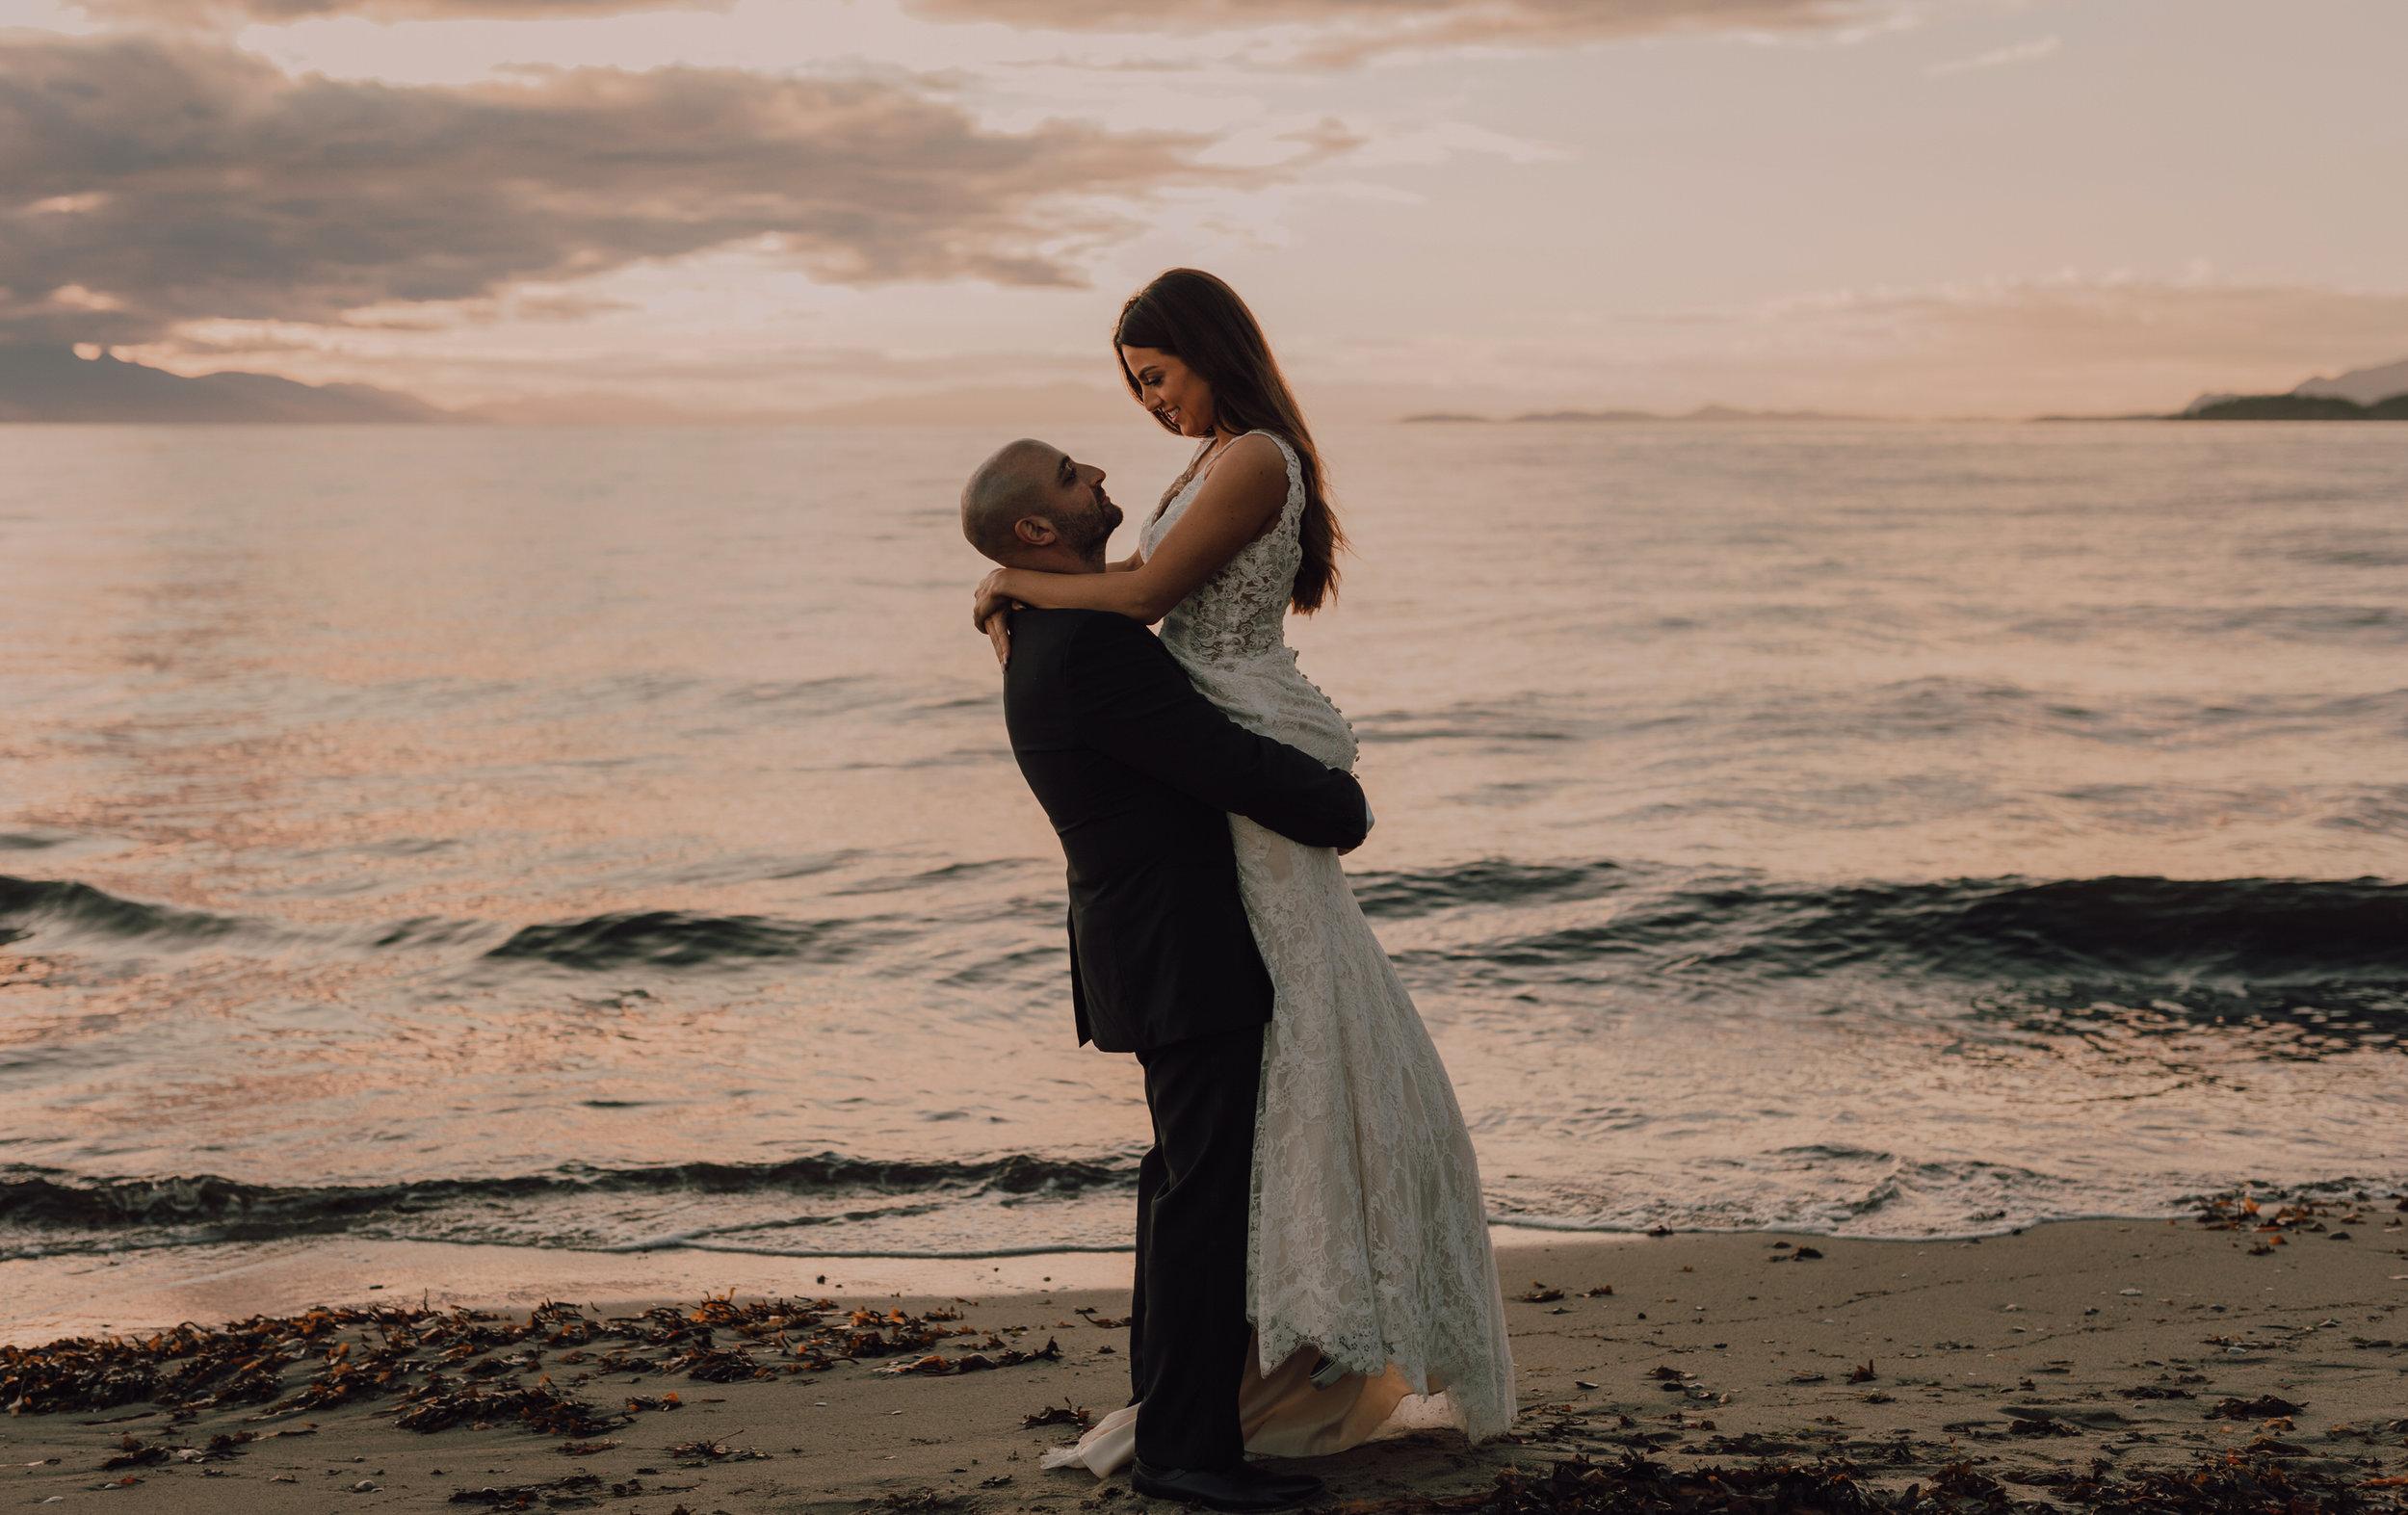 Day After Wedding Photos - Sunshine Coast Wedding Photos - Sunset Wedding Photos - Vancouver Wedding Photographer & Videographer - Sunshine Coast Wedding Photos - Sunshine Coast Wedding Photographer - Jennifer Picard Photography - 1A5A9349.jpg